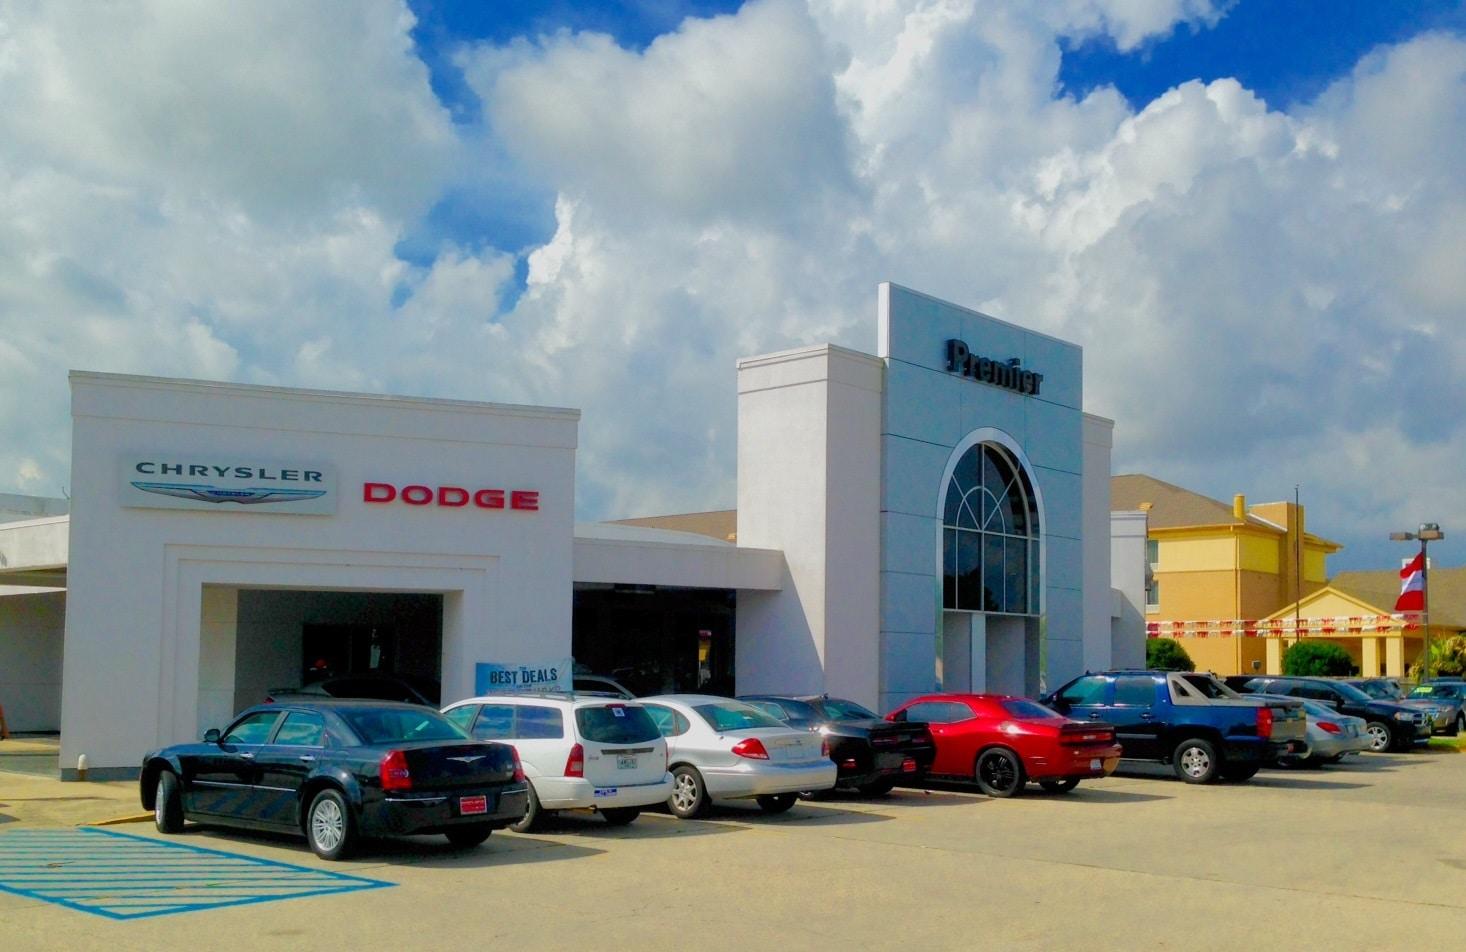 Used Car Dealerships On Blackstone Fresno Ca